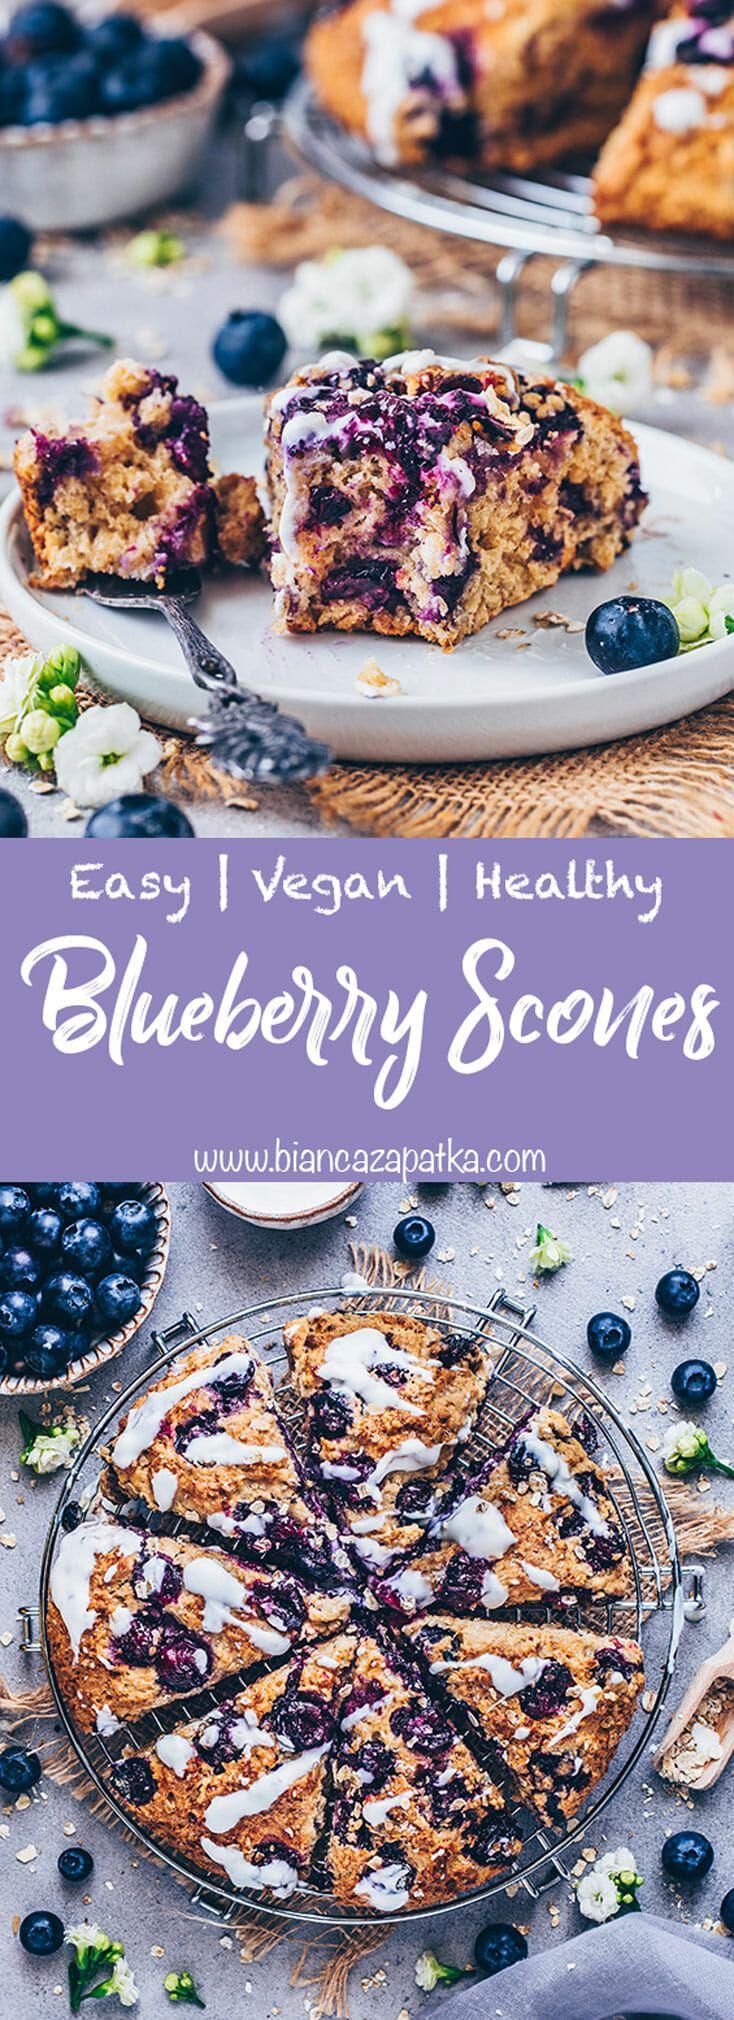 Vegan Blueberry Scones | Easy & Healthy - Bianca Zapatka | Recipes